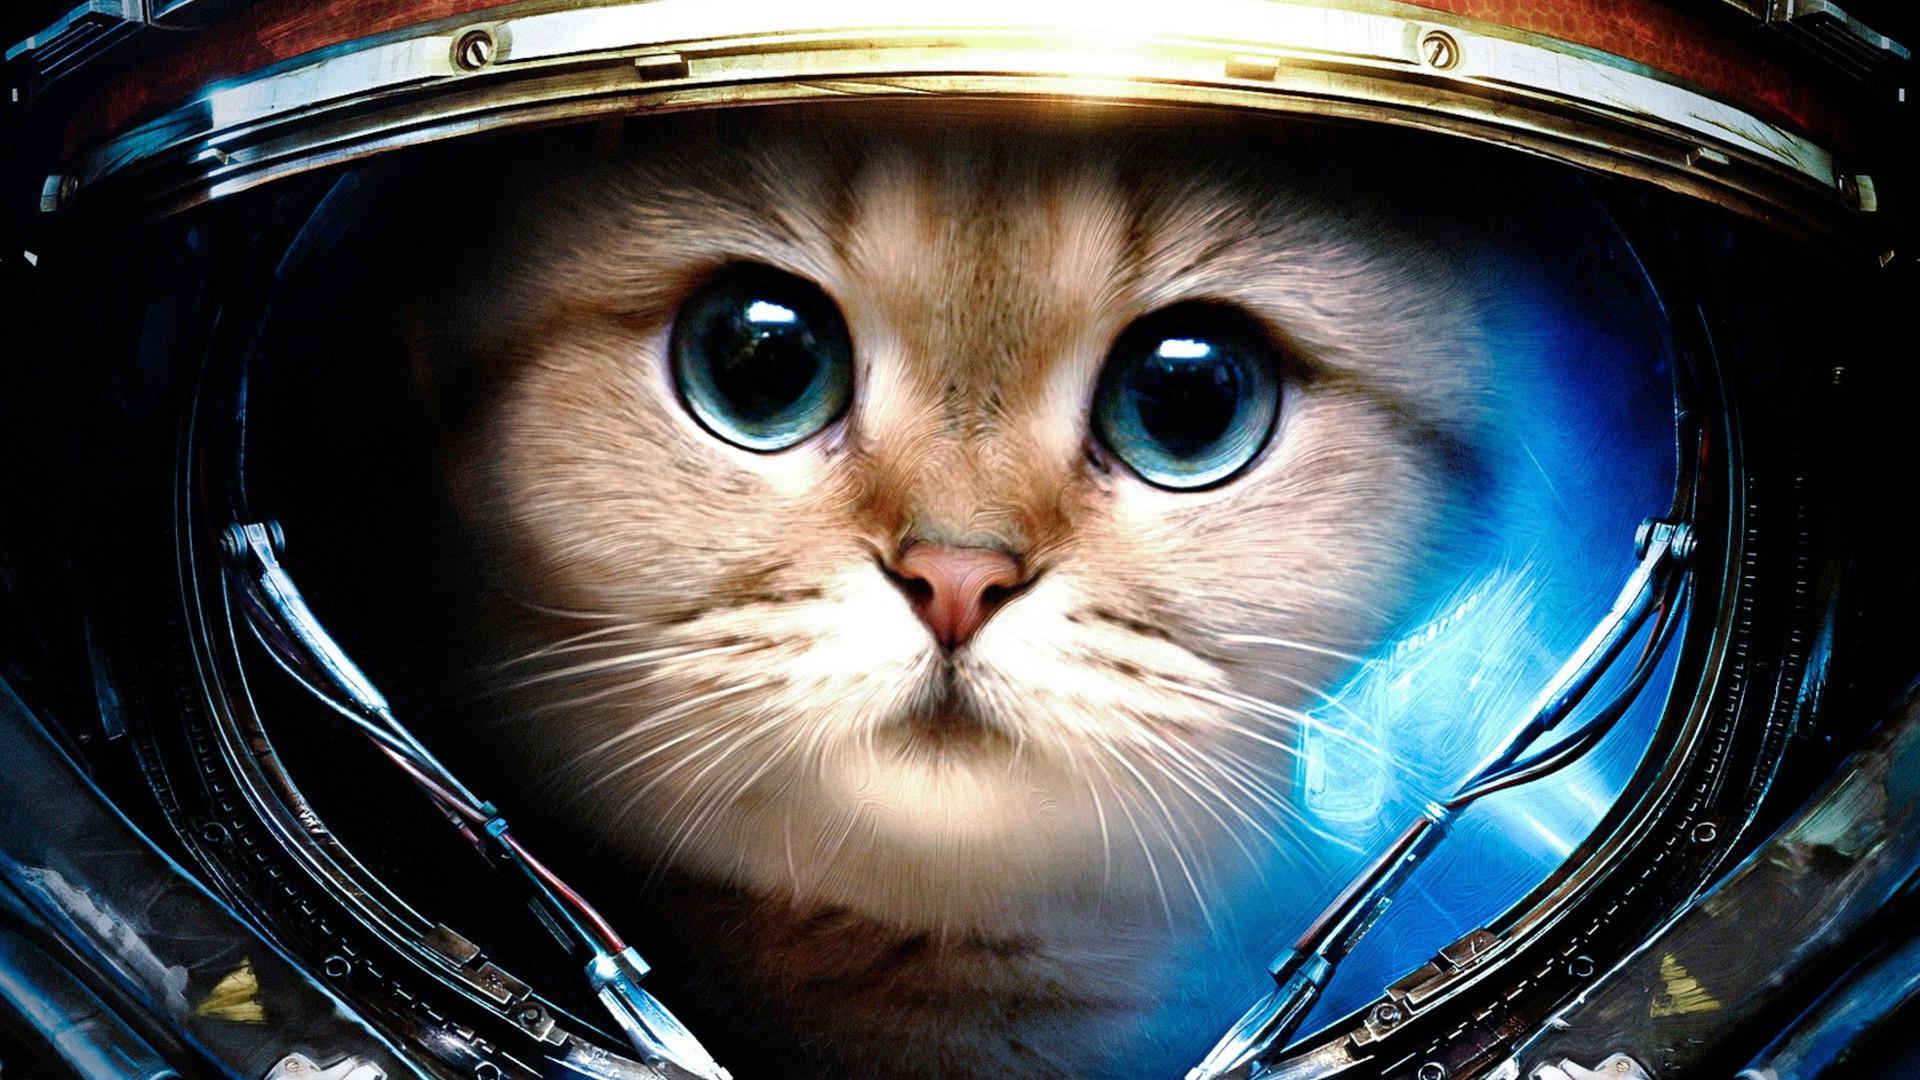 Space Cat Wallpapers | wallpaper, wallpaper hd, background desktop